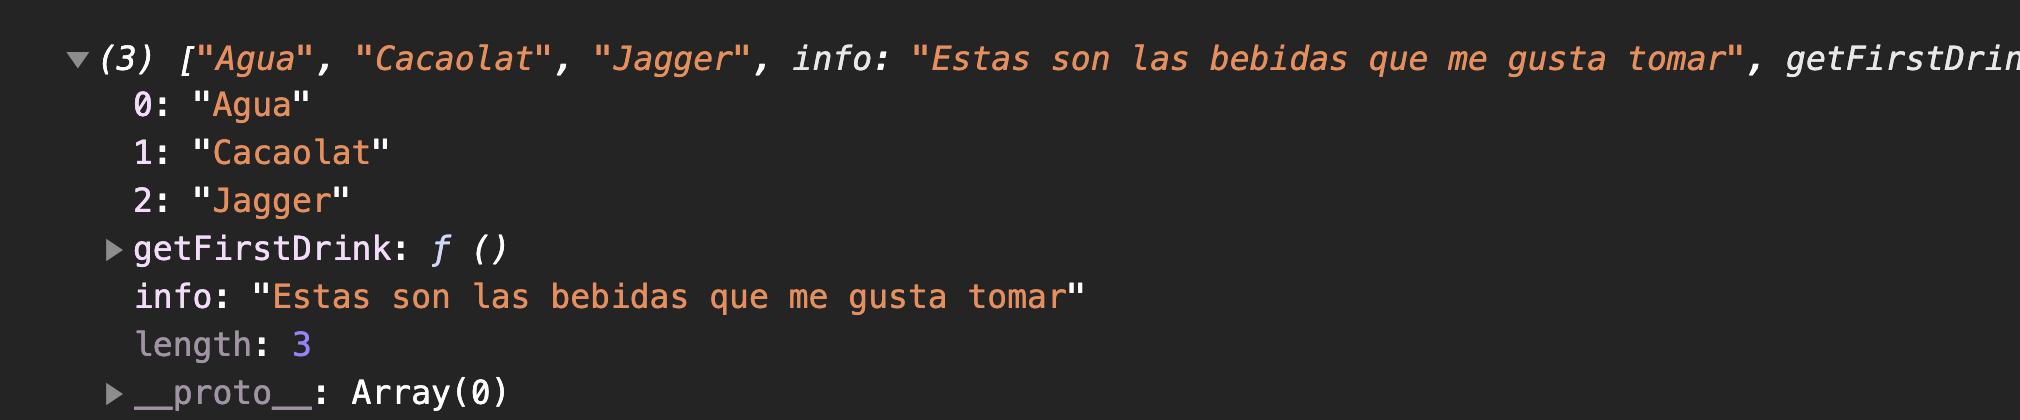 Prototipo de un objeto array en Javascript